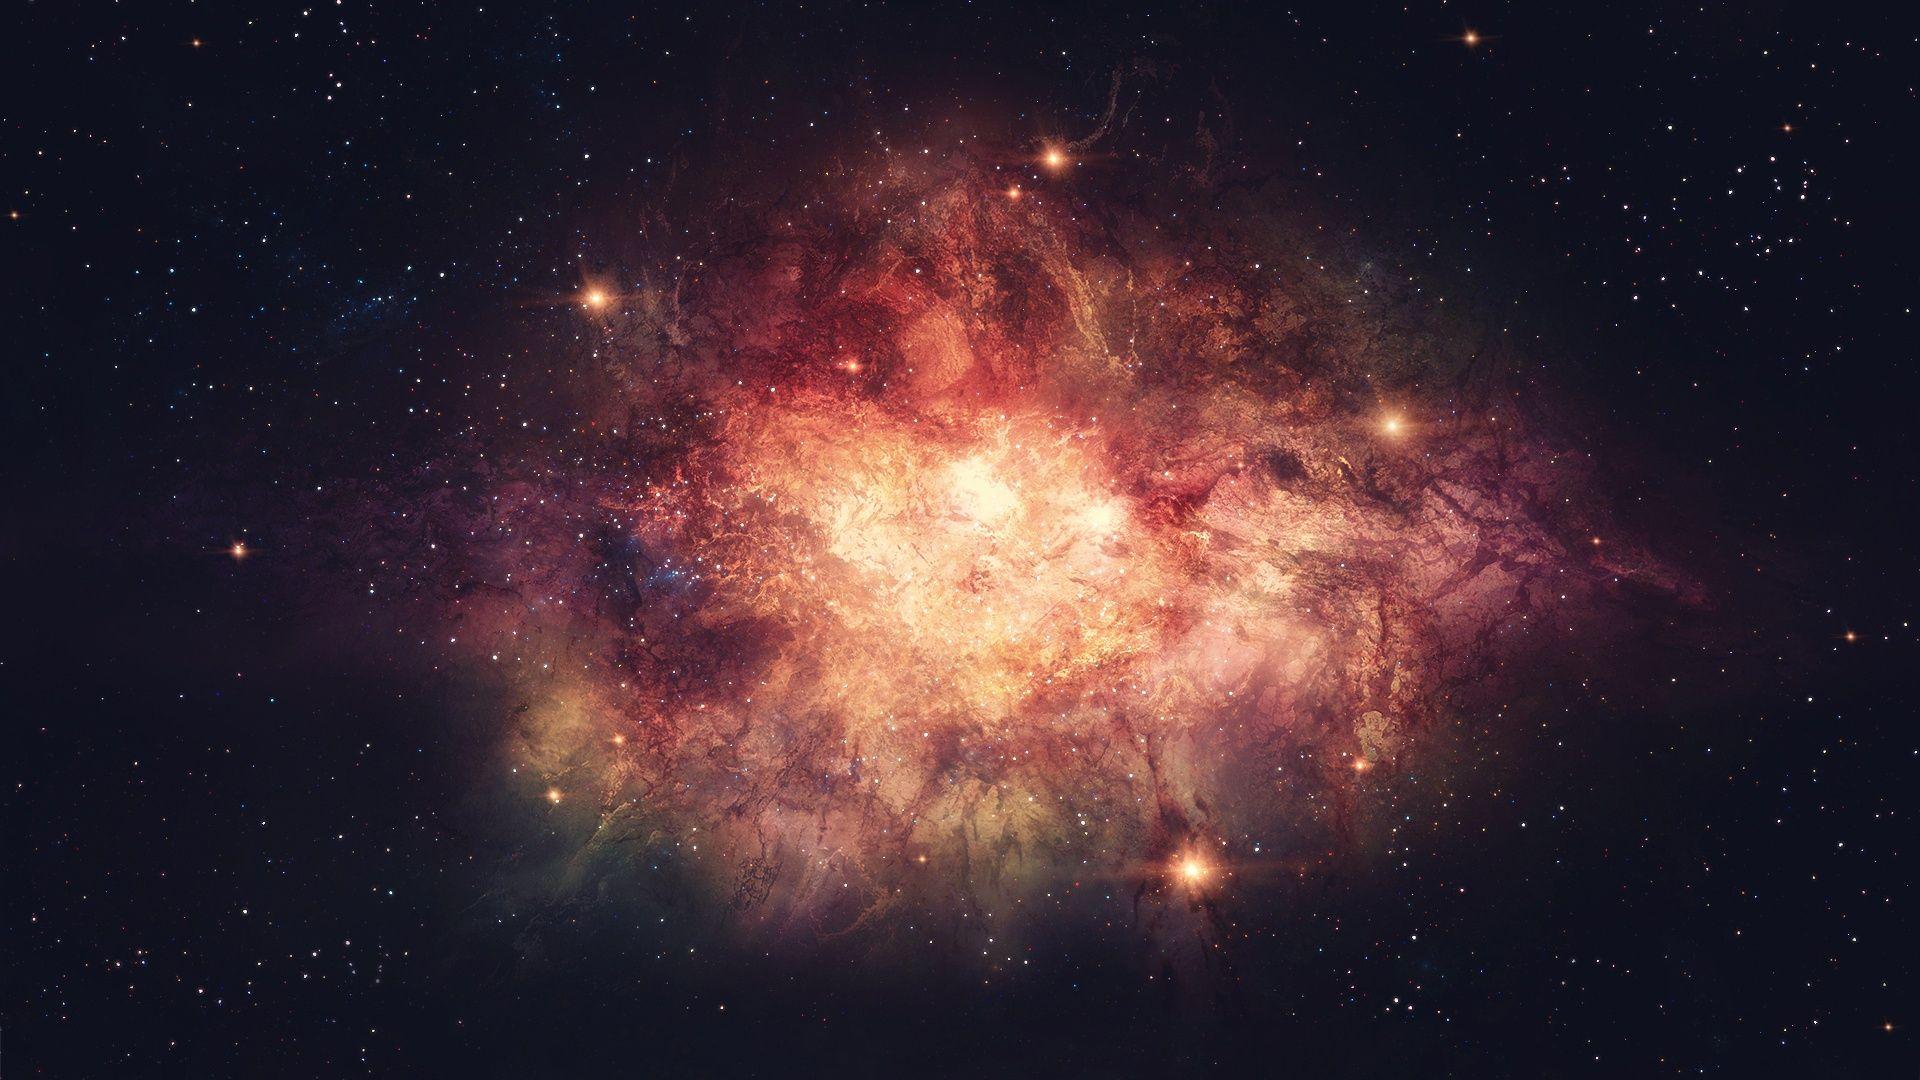 Hd wallpaper universe - Parallel Universe Hd Wallpapers 1920 1080 Universe Hd Wallpapers 36 Wallpapers Adorable